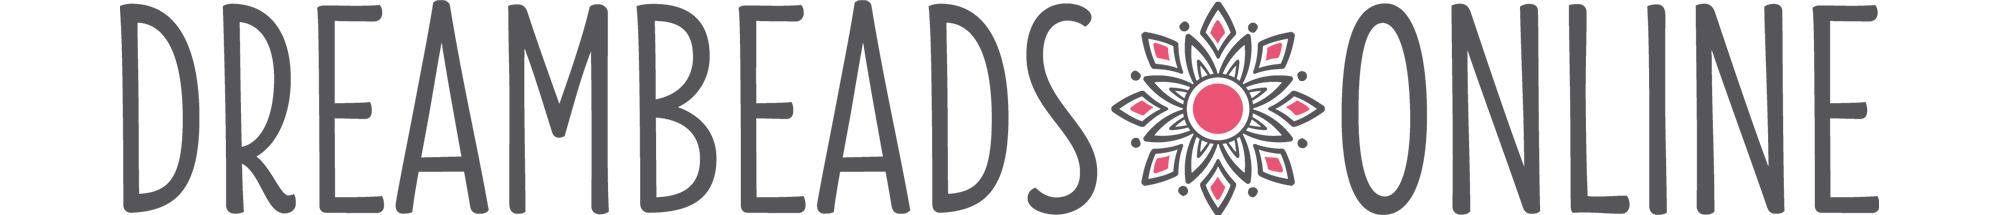 Online Bead Store & Wholesale